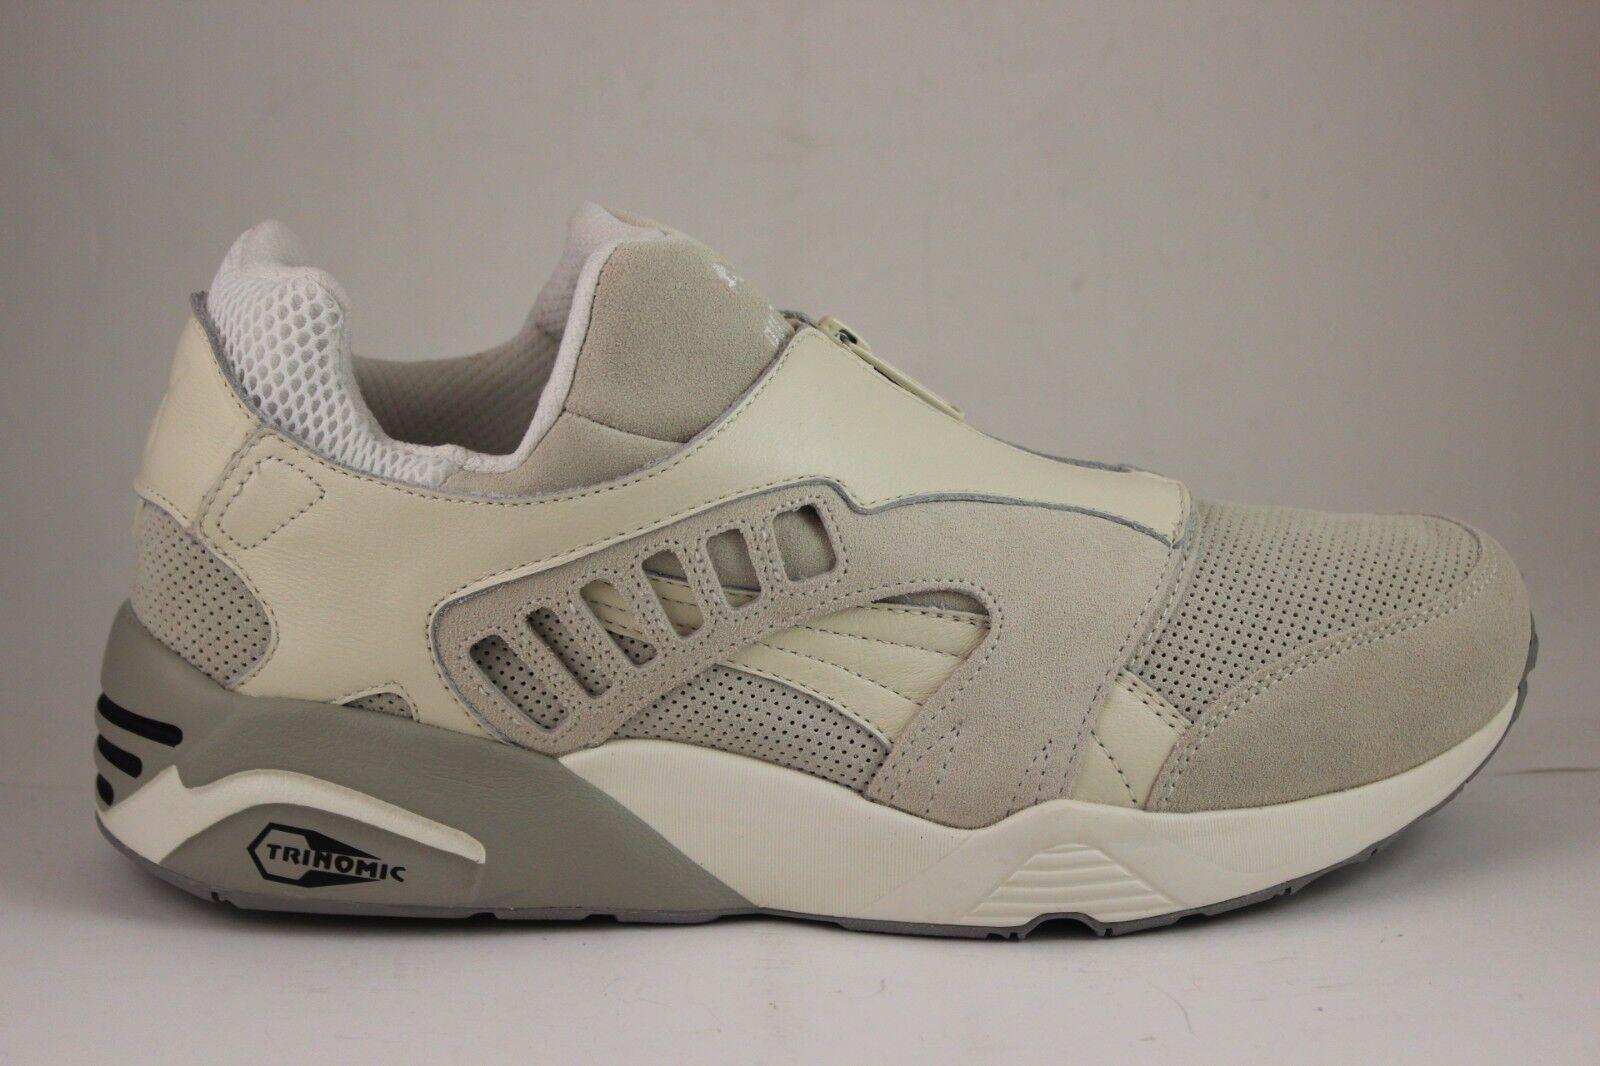 le skate chaussures cromer en huf chaussures en cromer cuir 9 42 prime de blanc fc30fb